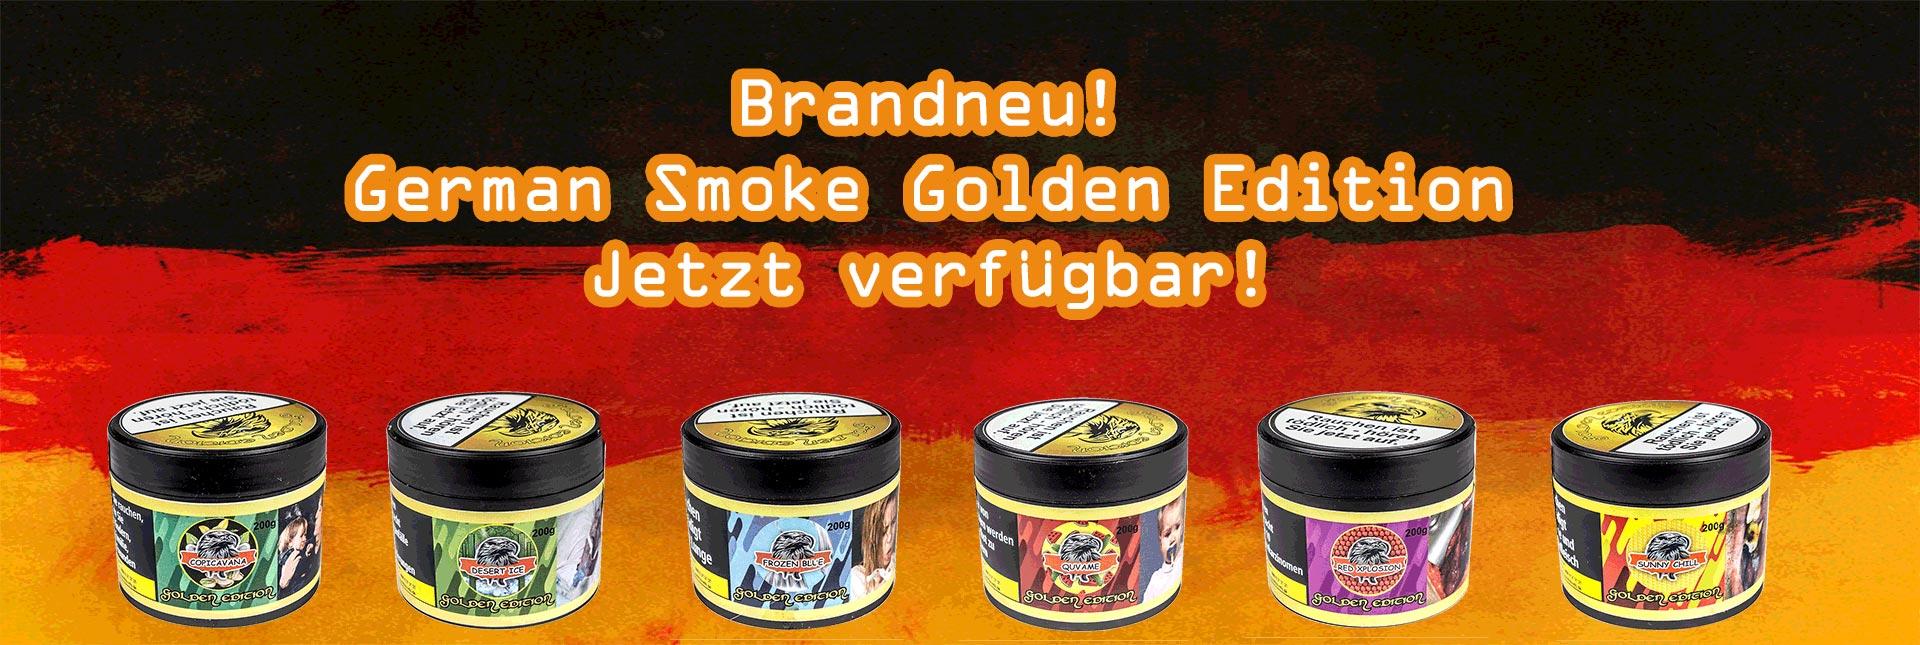 German Smoke Golden Edition